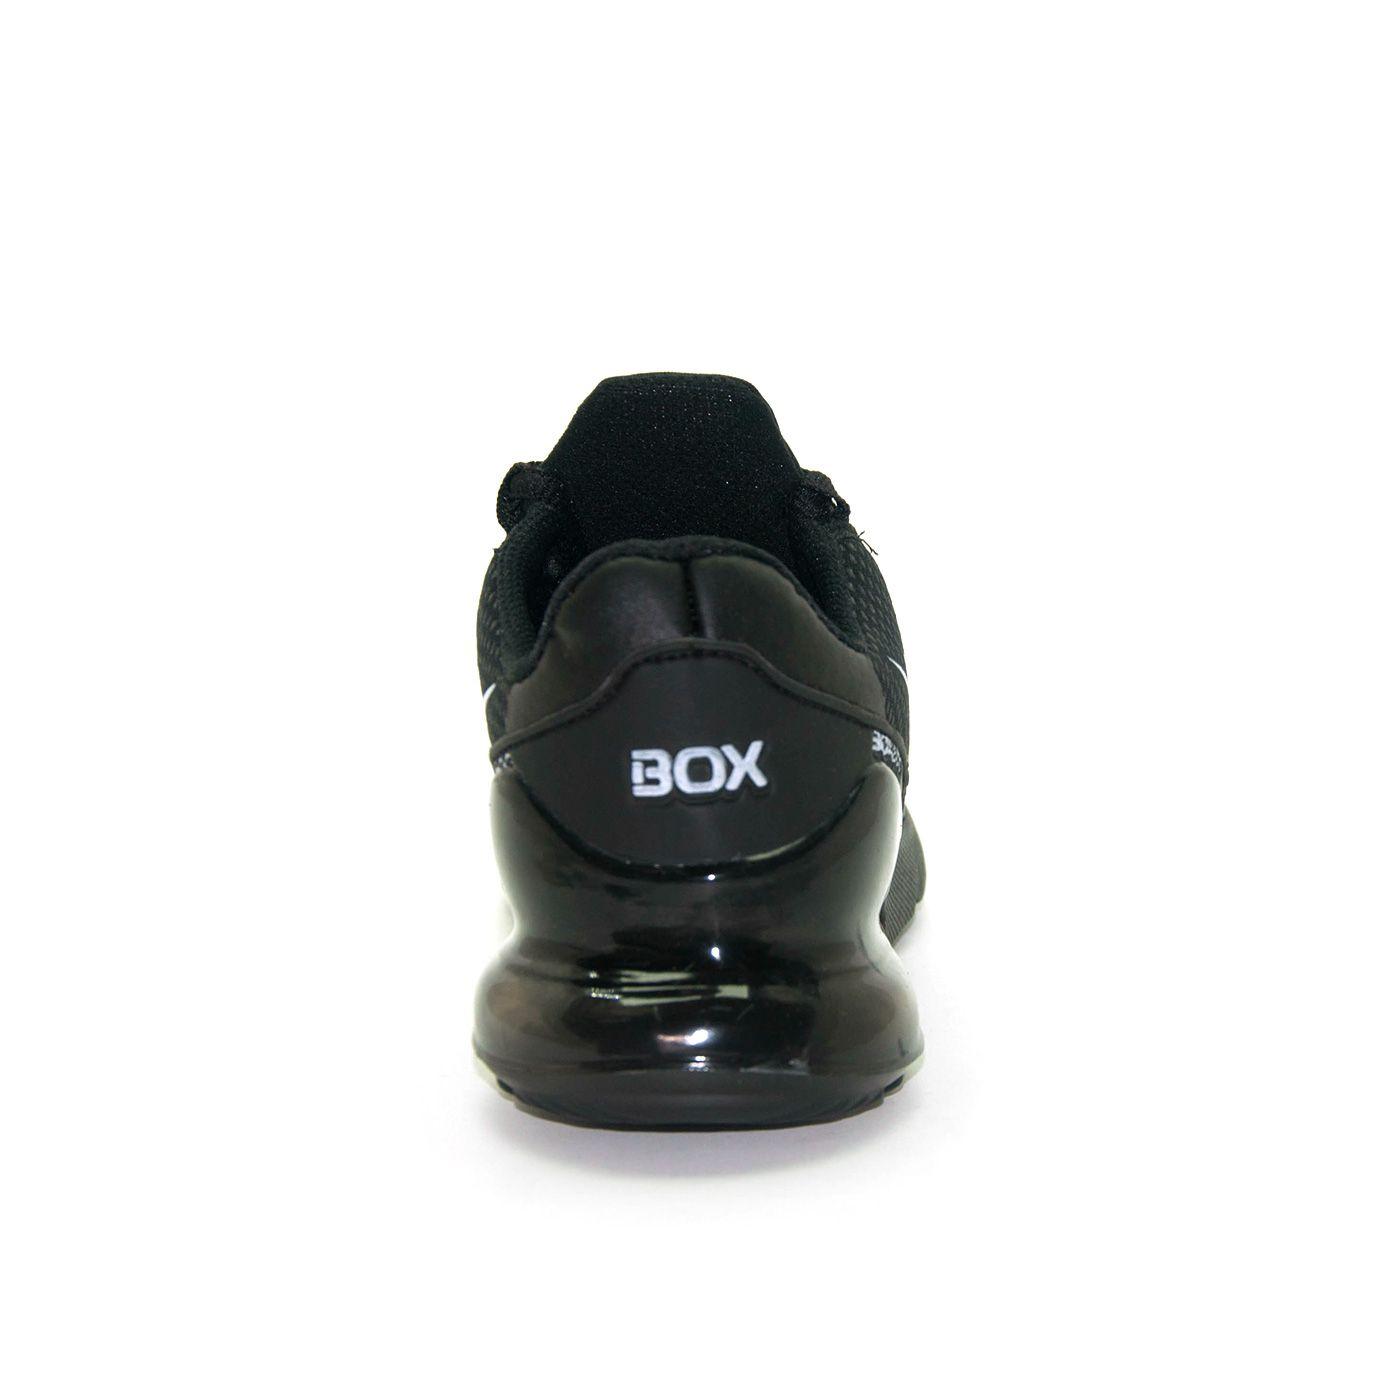 TENIS BOX 200 AIR MASCULINO INFANTIL / JUVENIL - BK1350